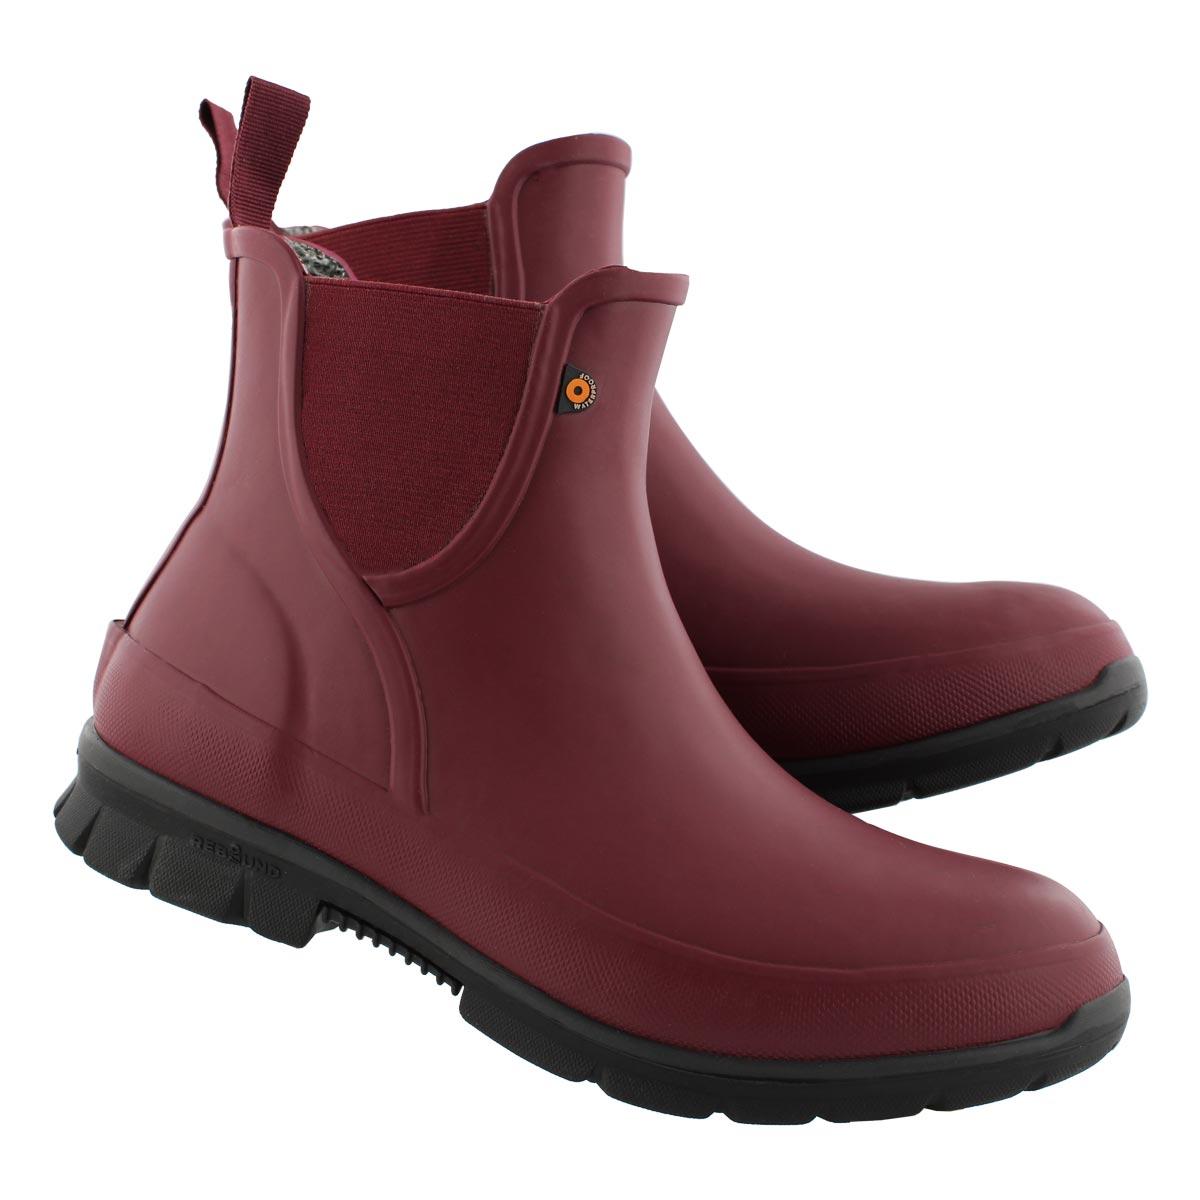 Lds Amanda Plush bgdy wtpf chelsea boot